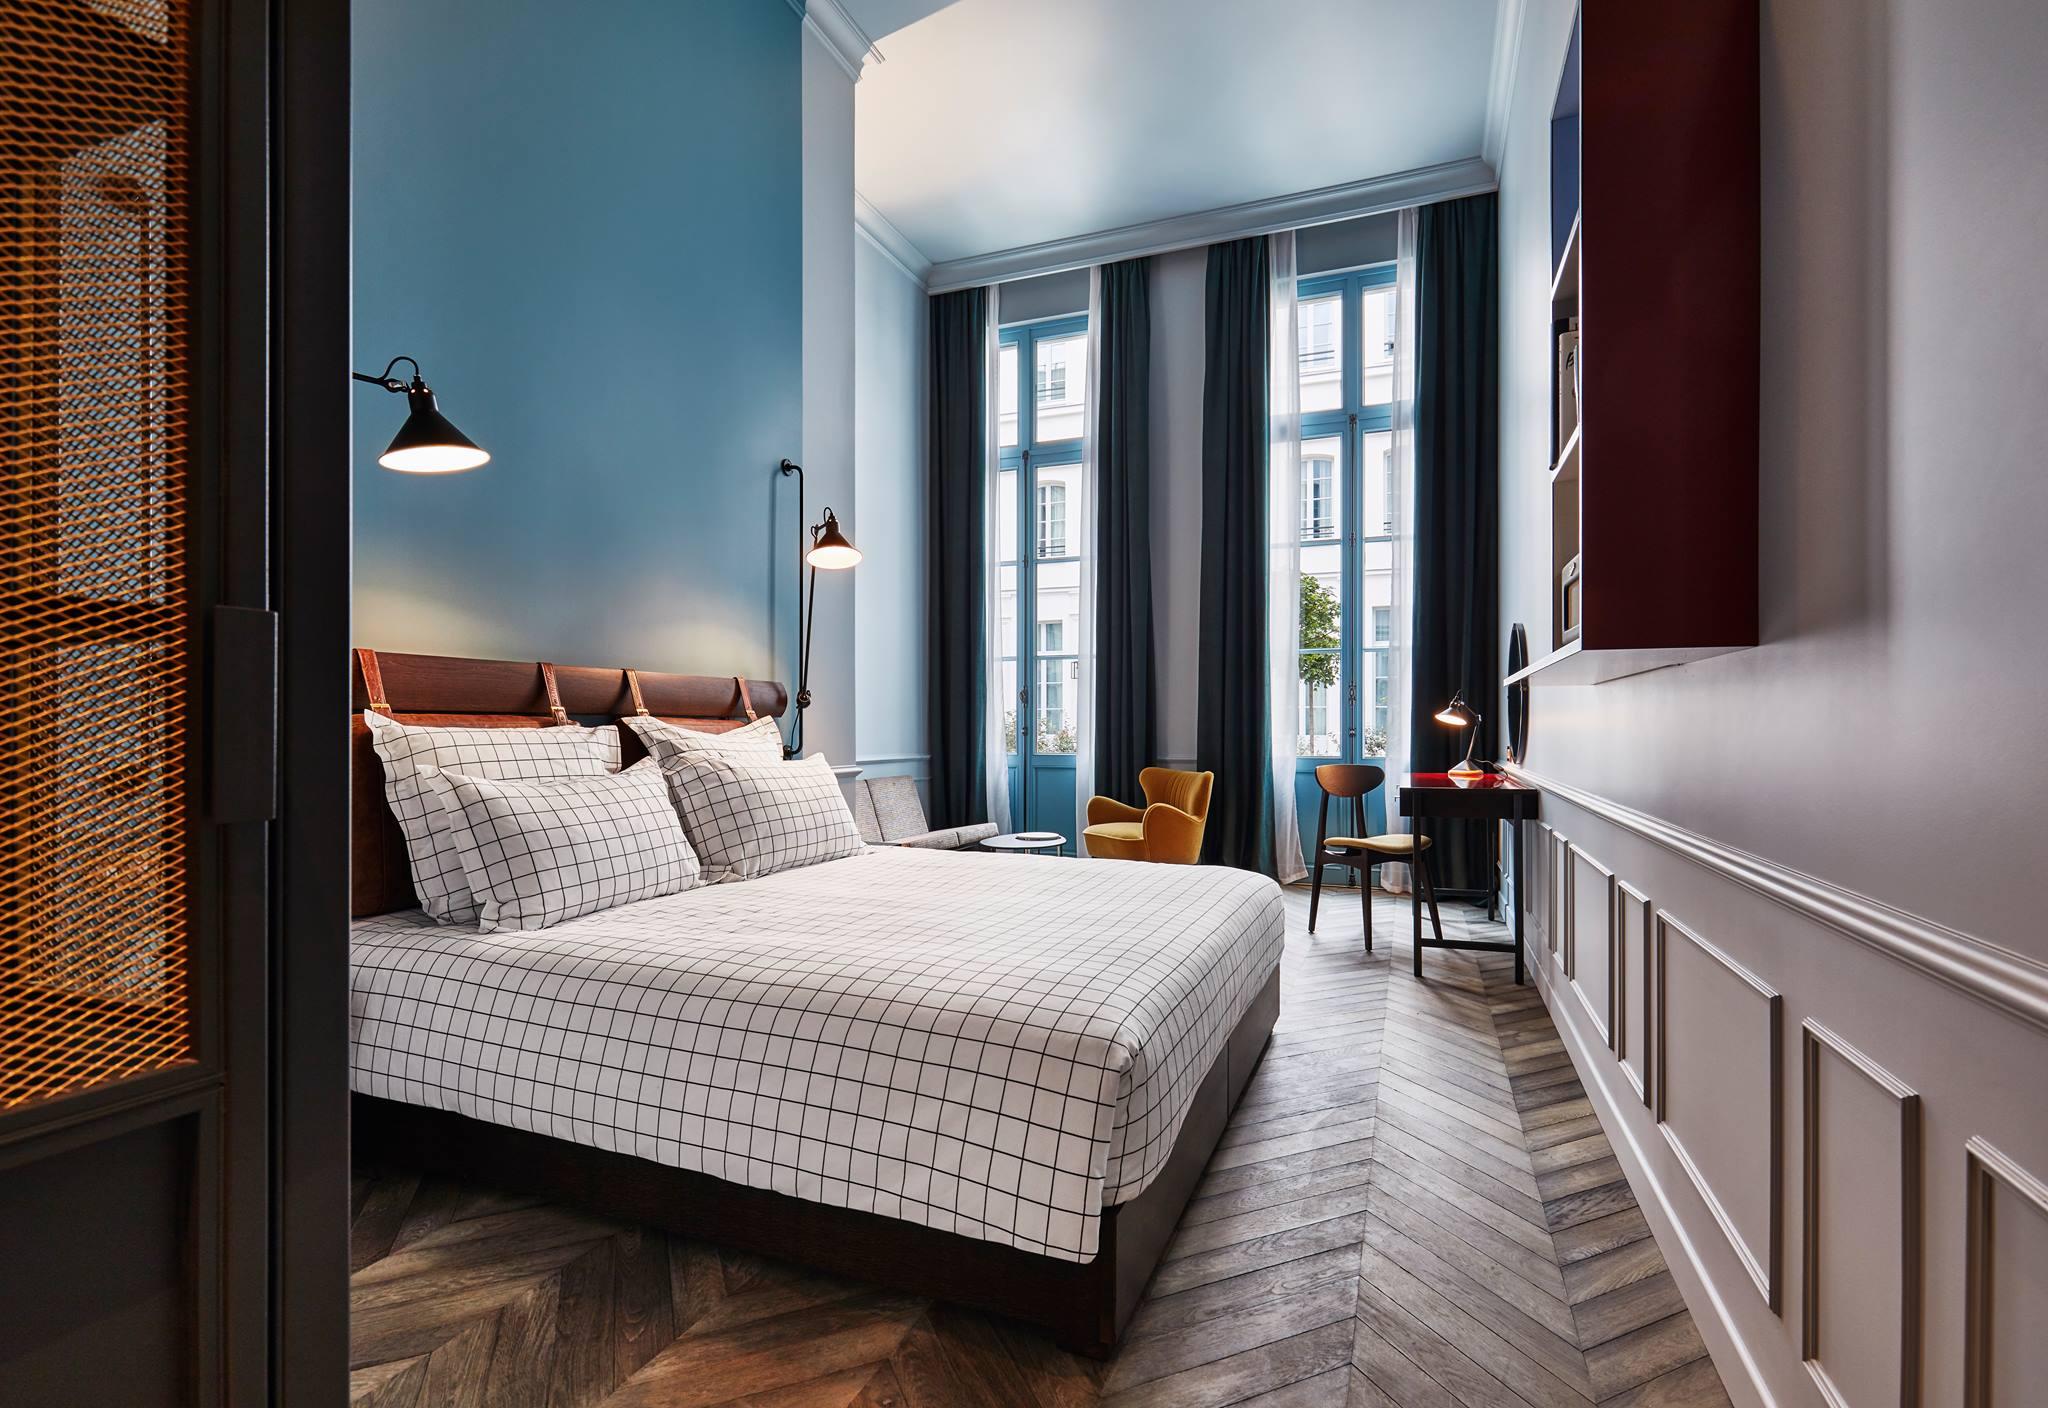 THE_HOXTON_PARIS_HOTEL_WEEKEND4.jpg